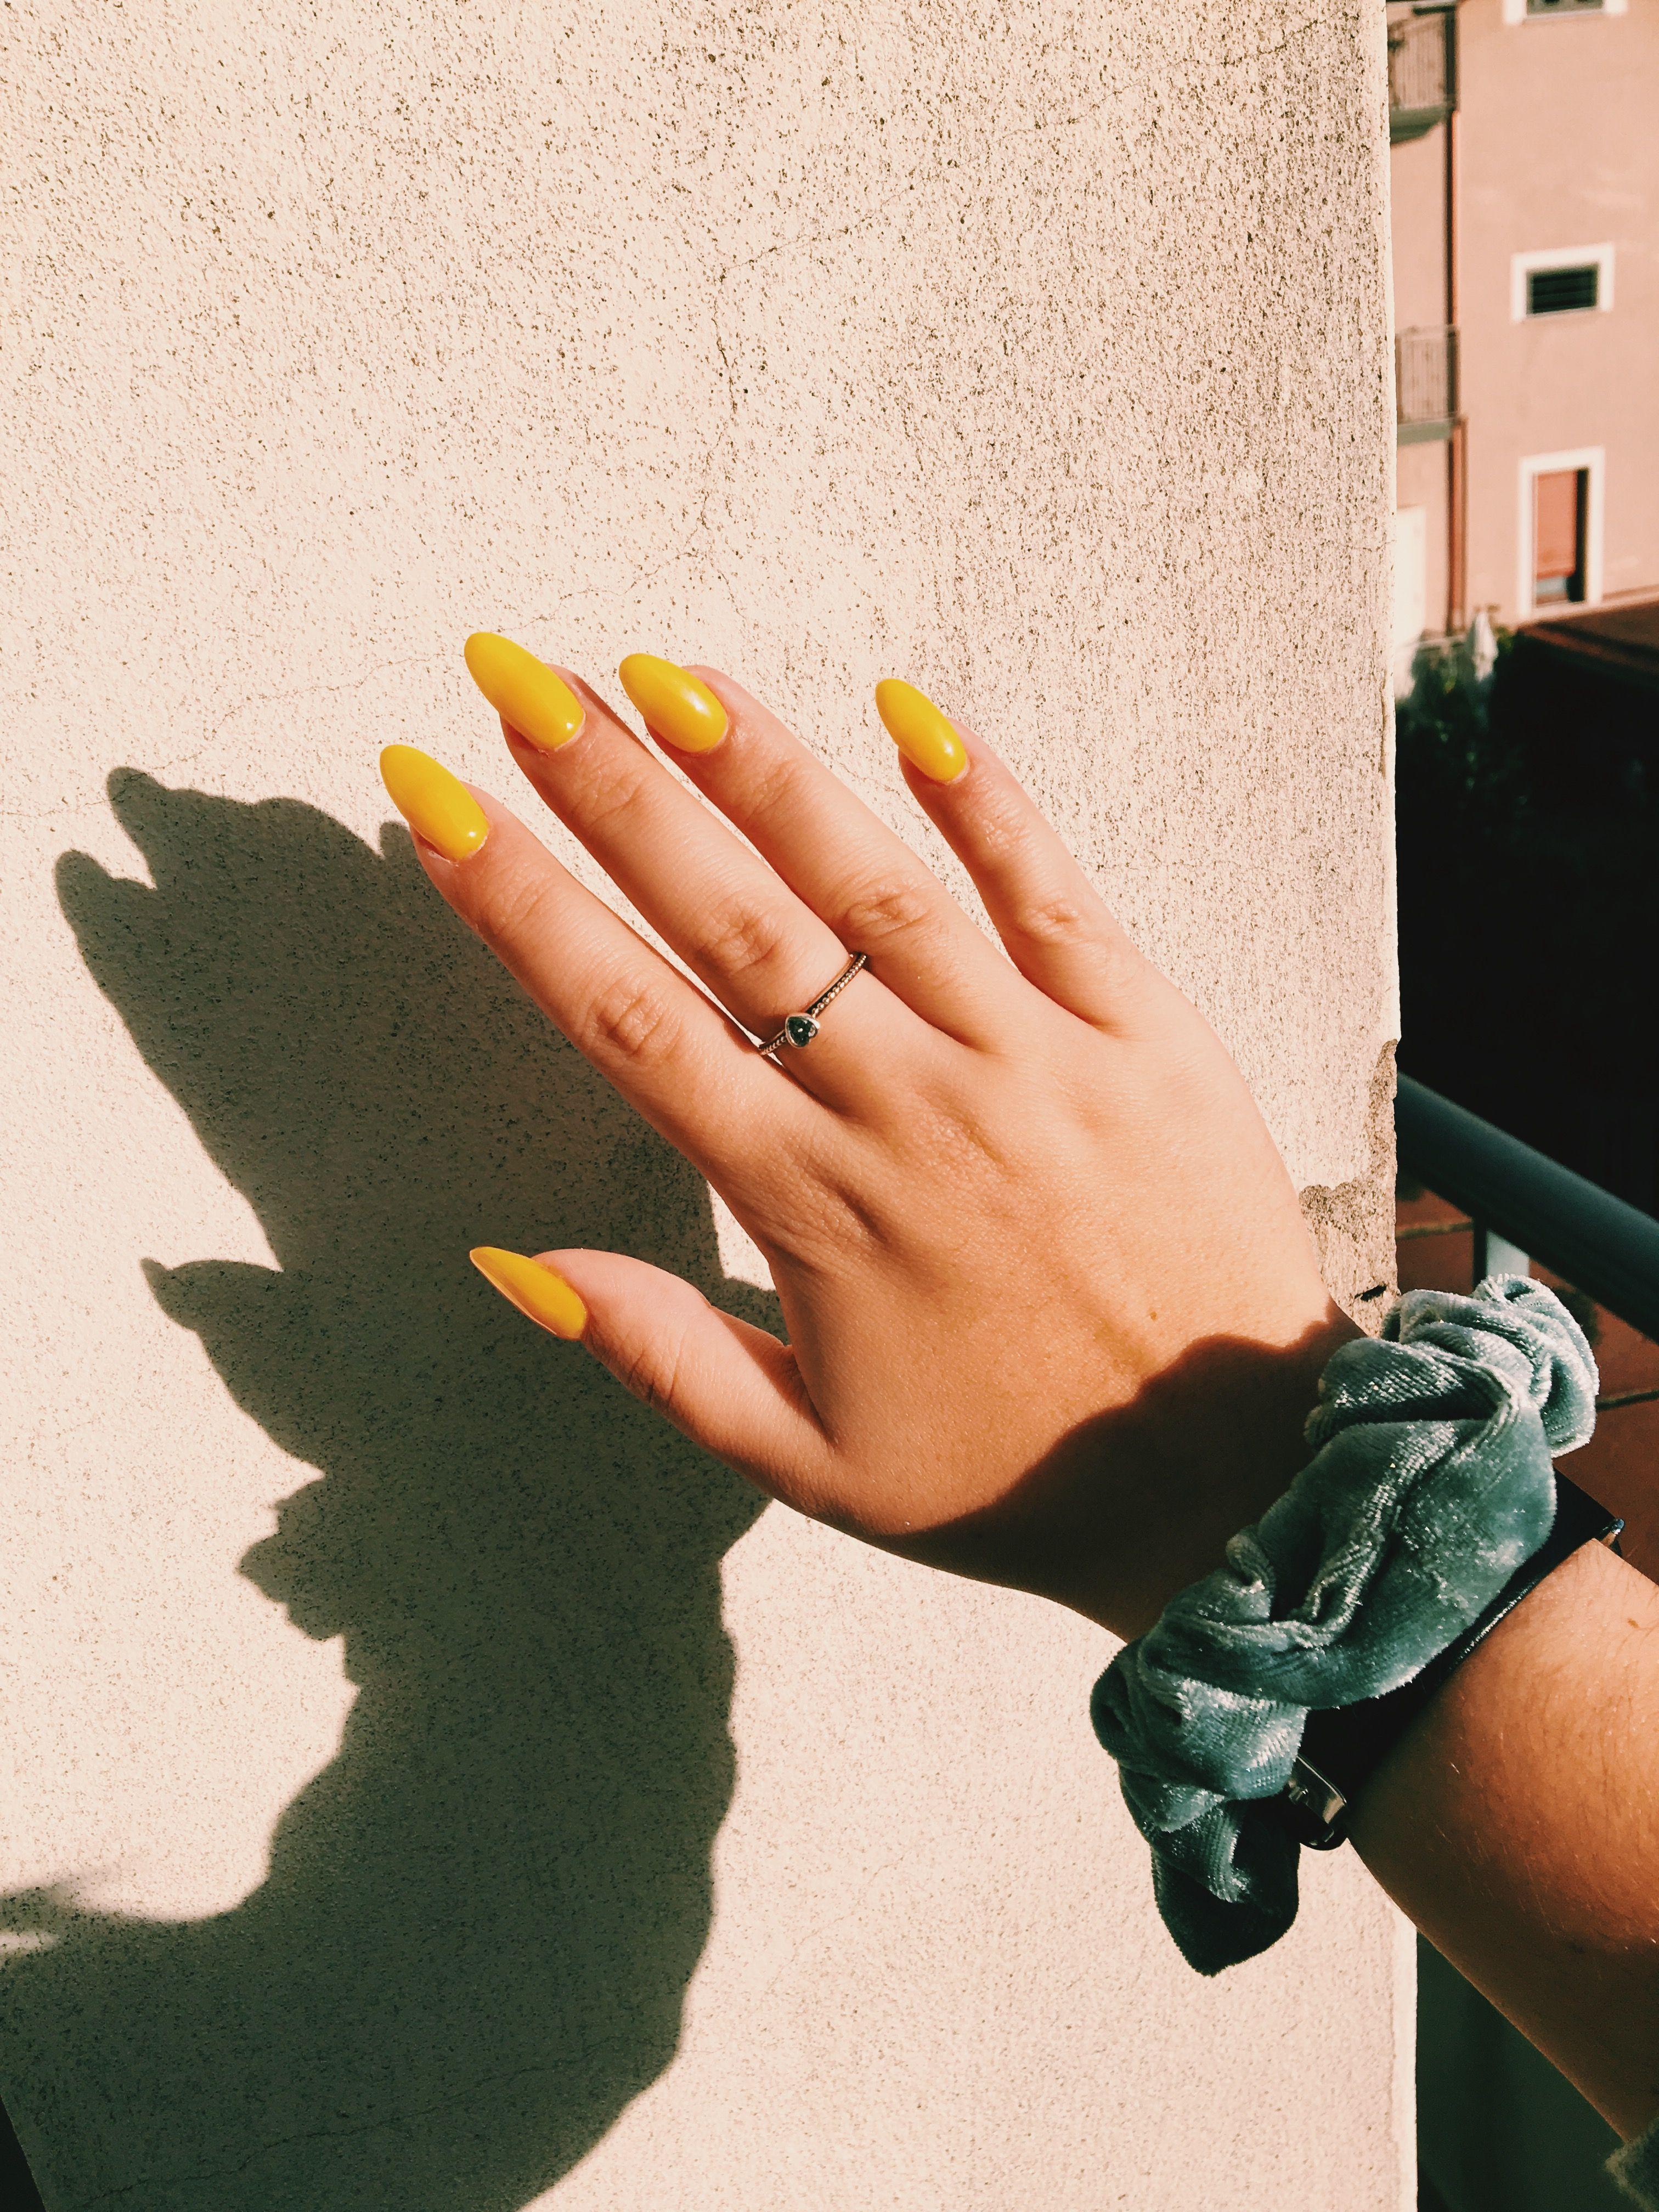 Nails Yellownails Aesthetic Summer Moodboard Longnails Italian Italy Scrunchies Pandora Music Nails Pastel Glitter Nails Cute Nails